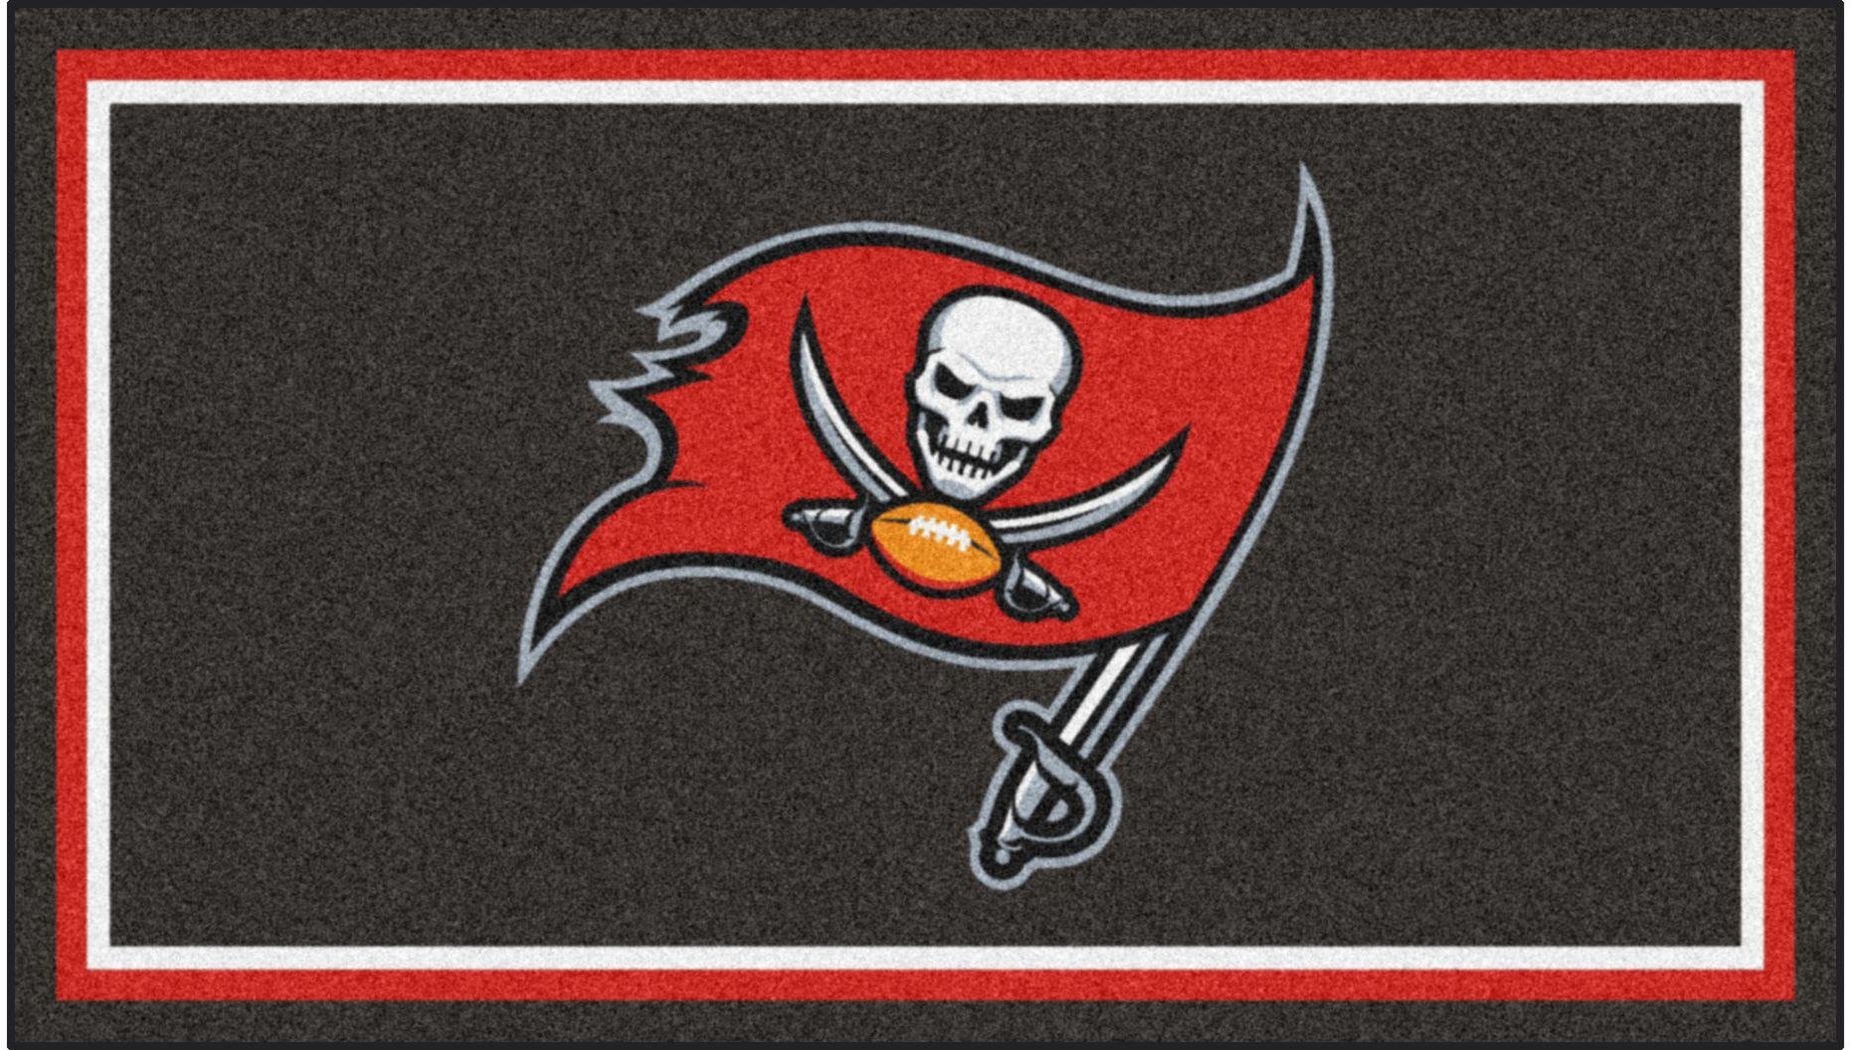 NFL Big Game Tampa Bay Buccaneers 3' x 5' Rug